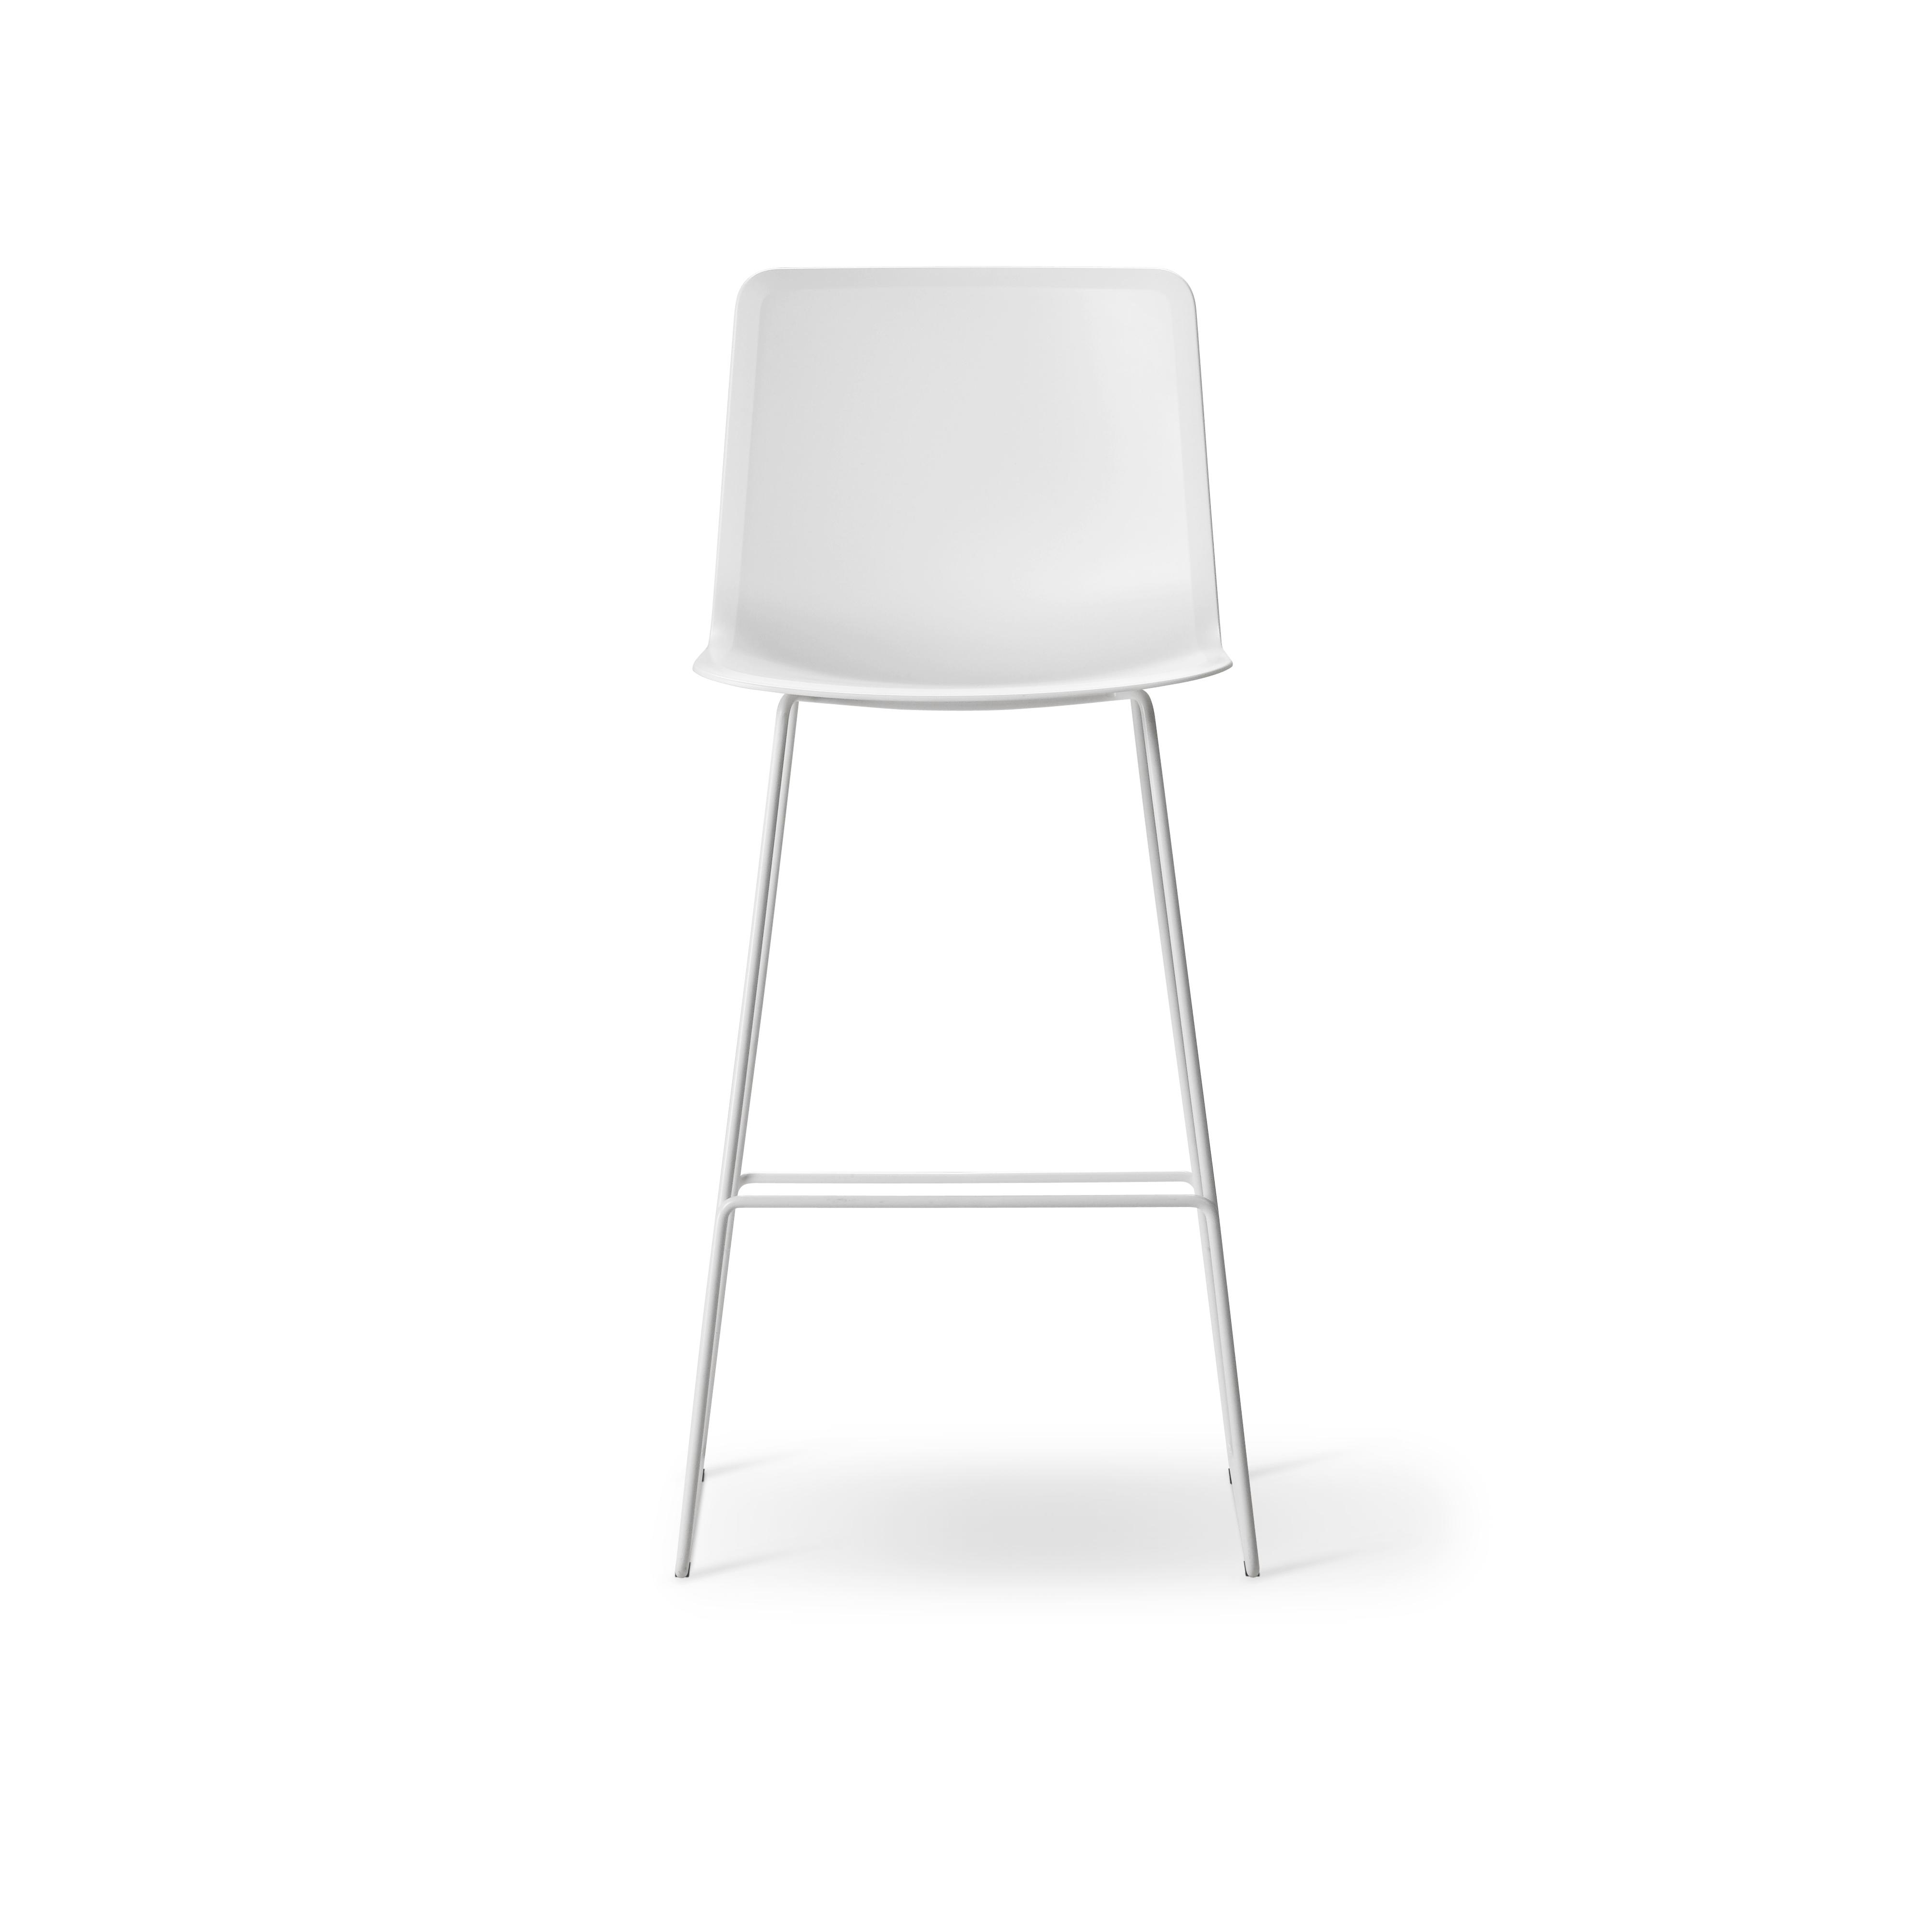 Marvelous Pato Sledge Barstool Inzonedesignstudio Interior Chair Design Inzonedesignstudiocom